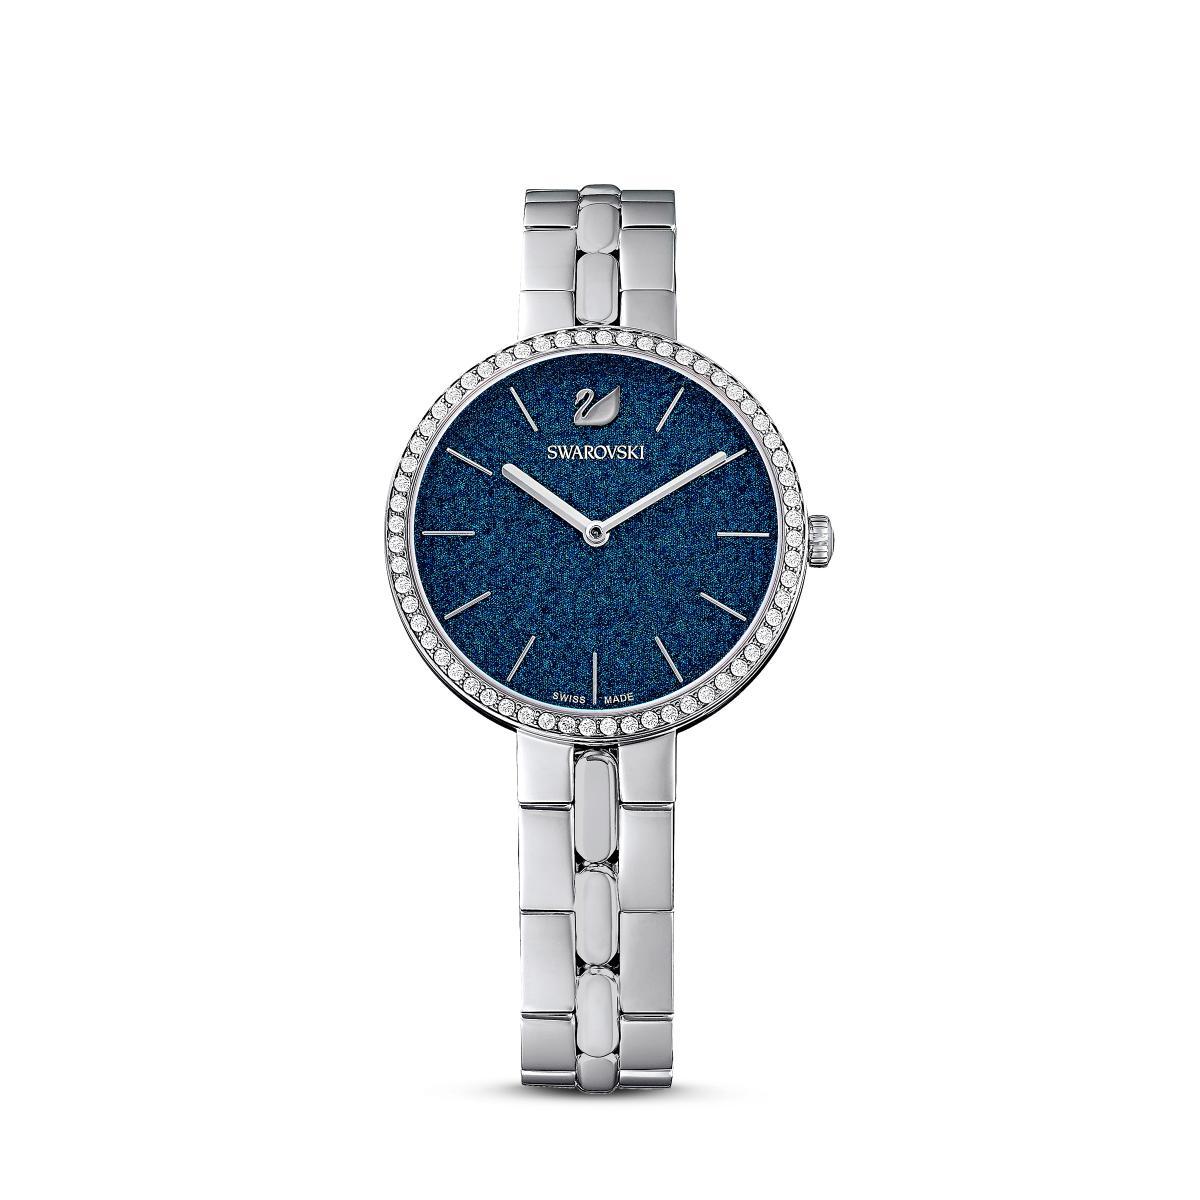 MONTRES 5517790 - COSMOPOLITAN - Swarovski montres - Modalova